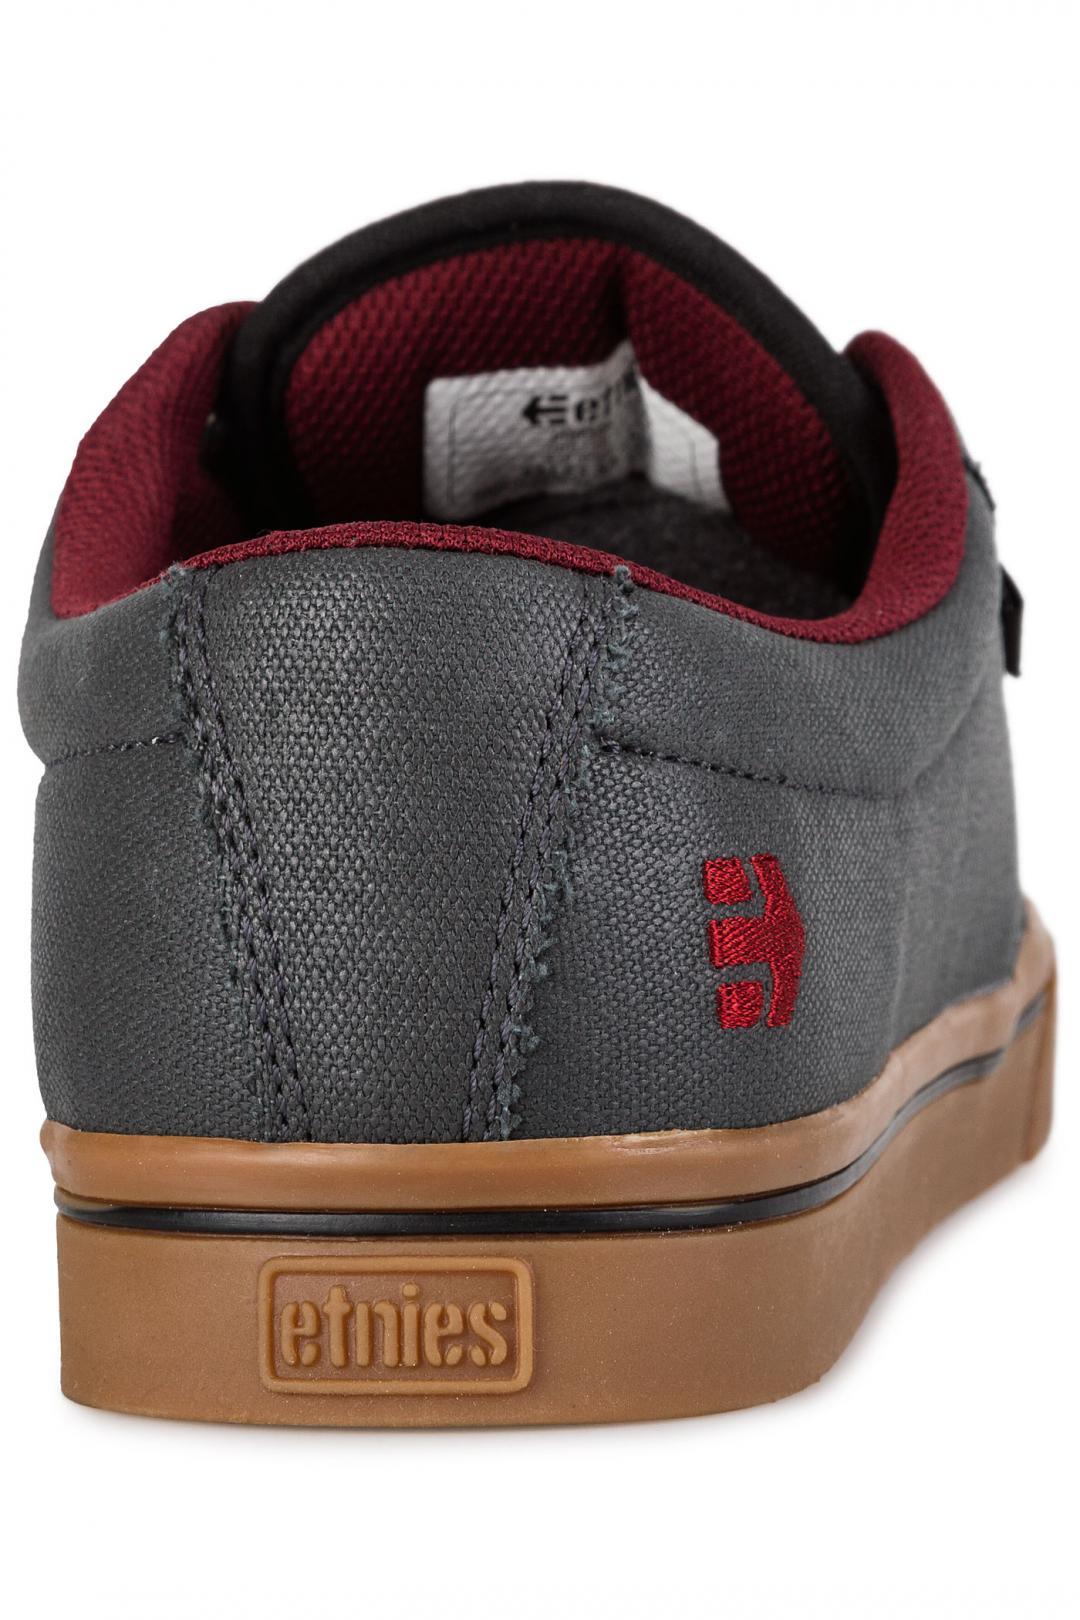 Uomo Etnies Jameson 2 Eco grey gum red   Sneaker